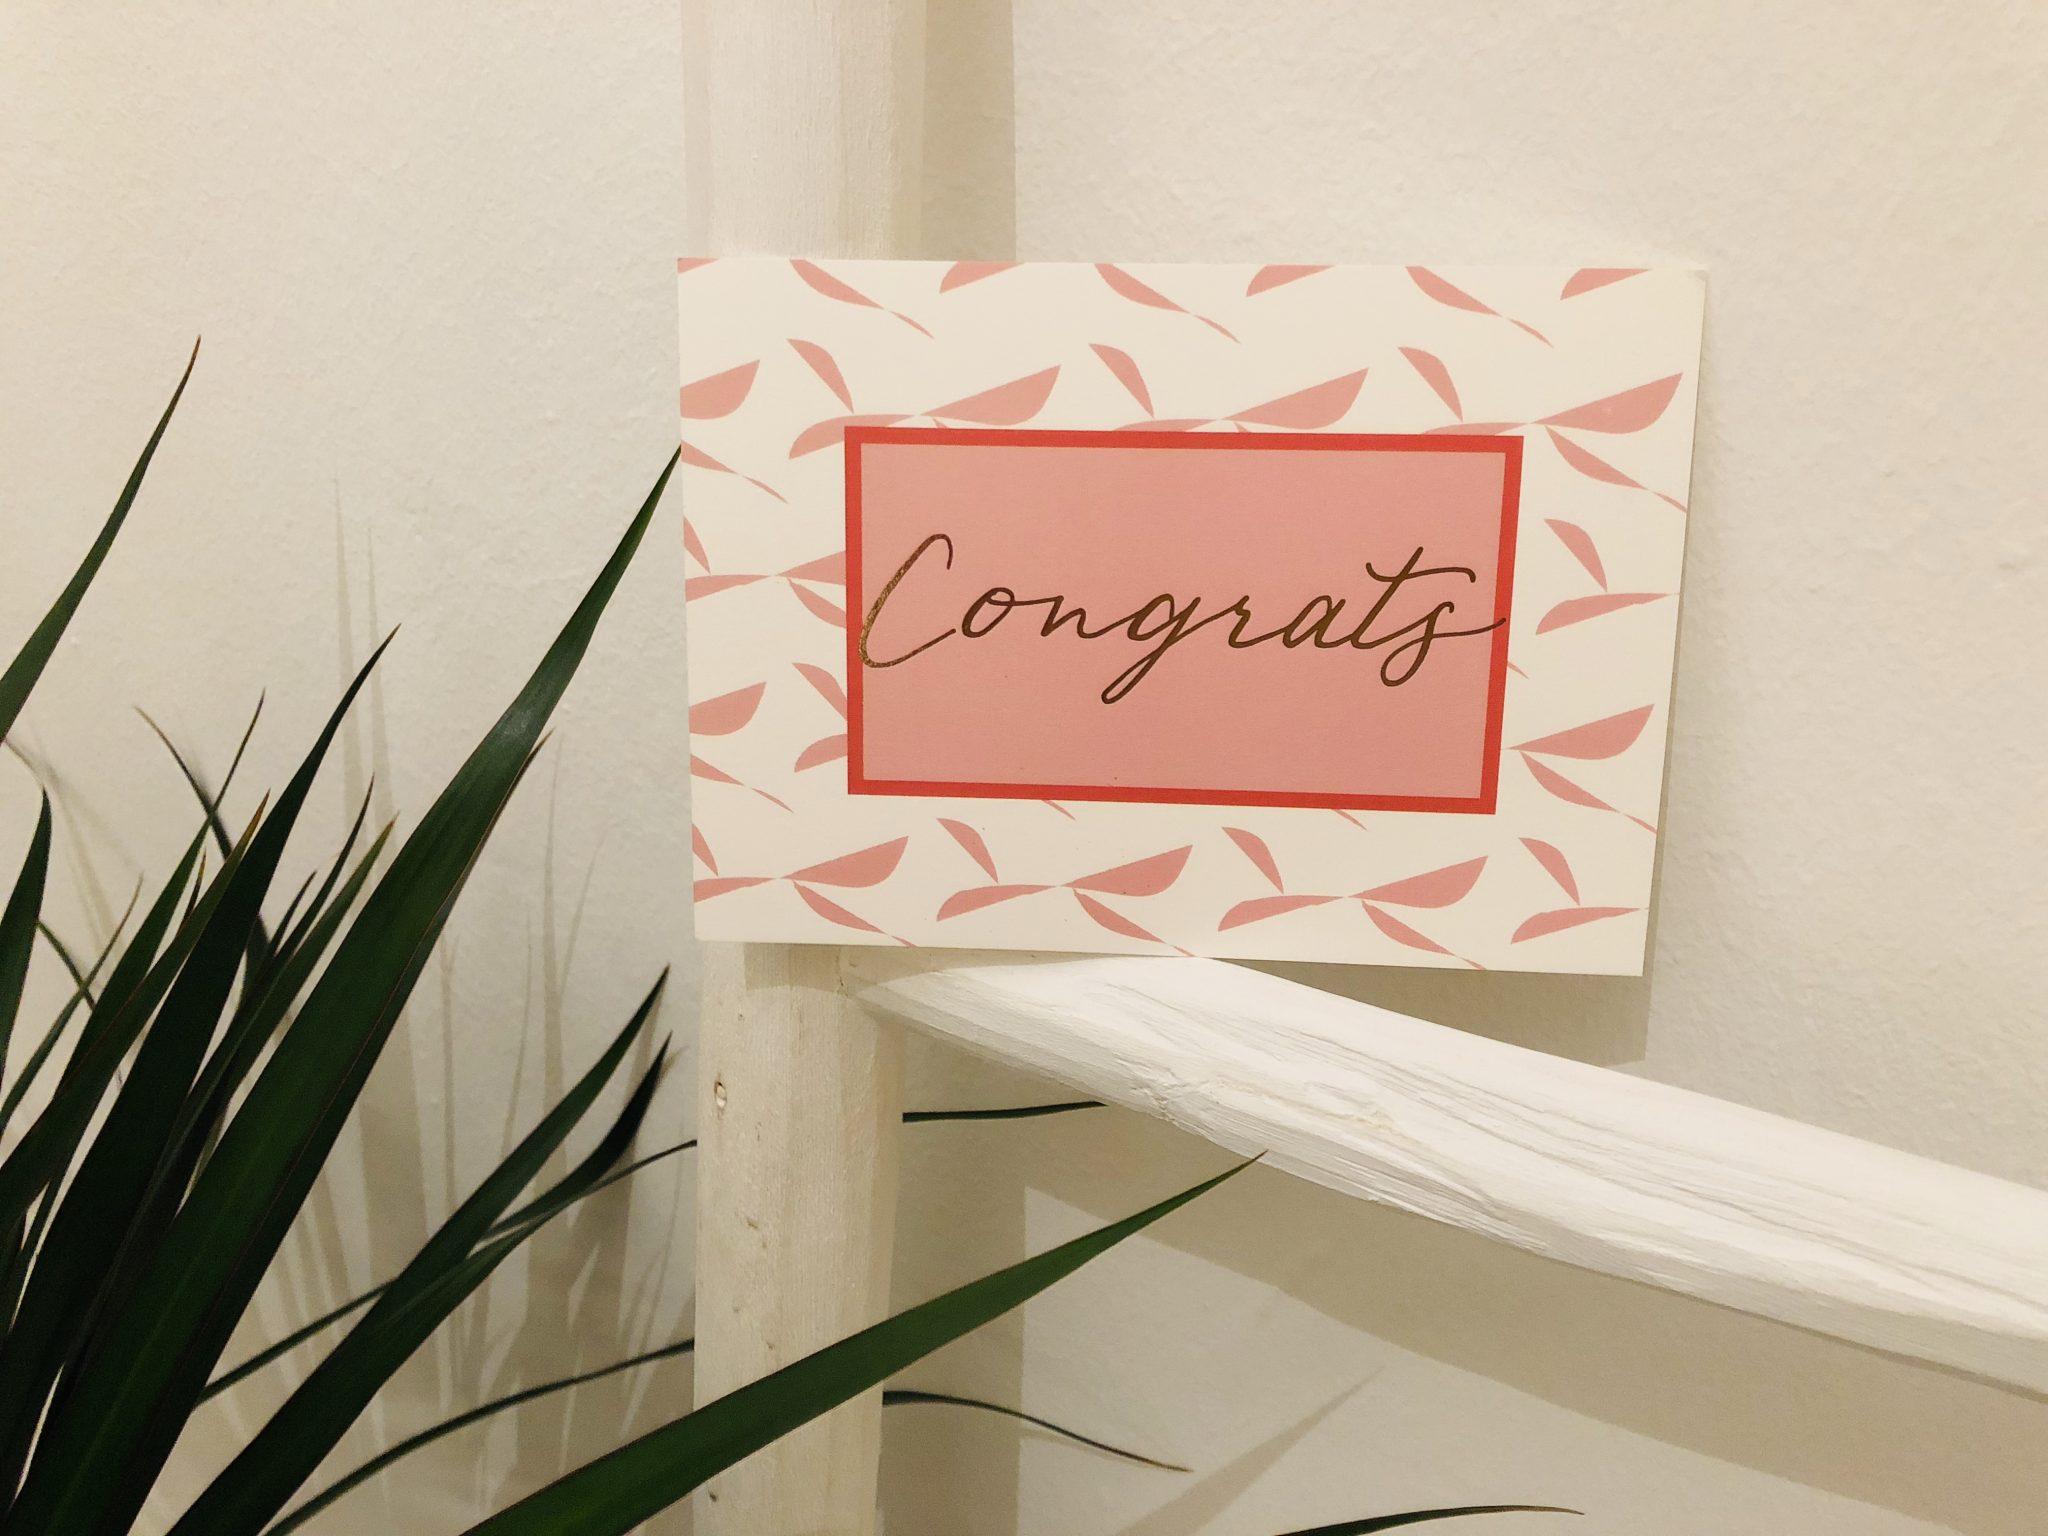 Grußkarte Congrats